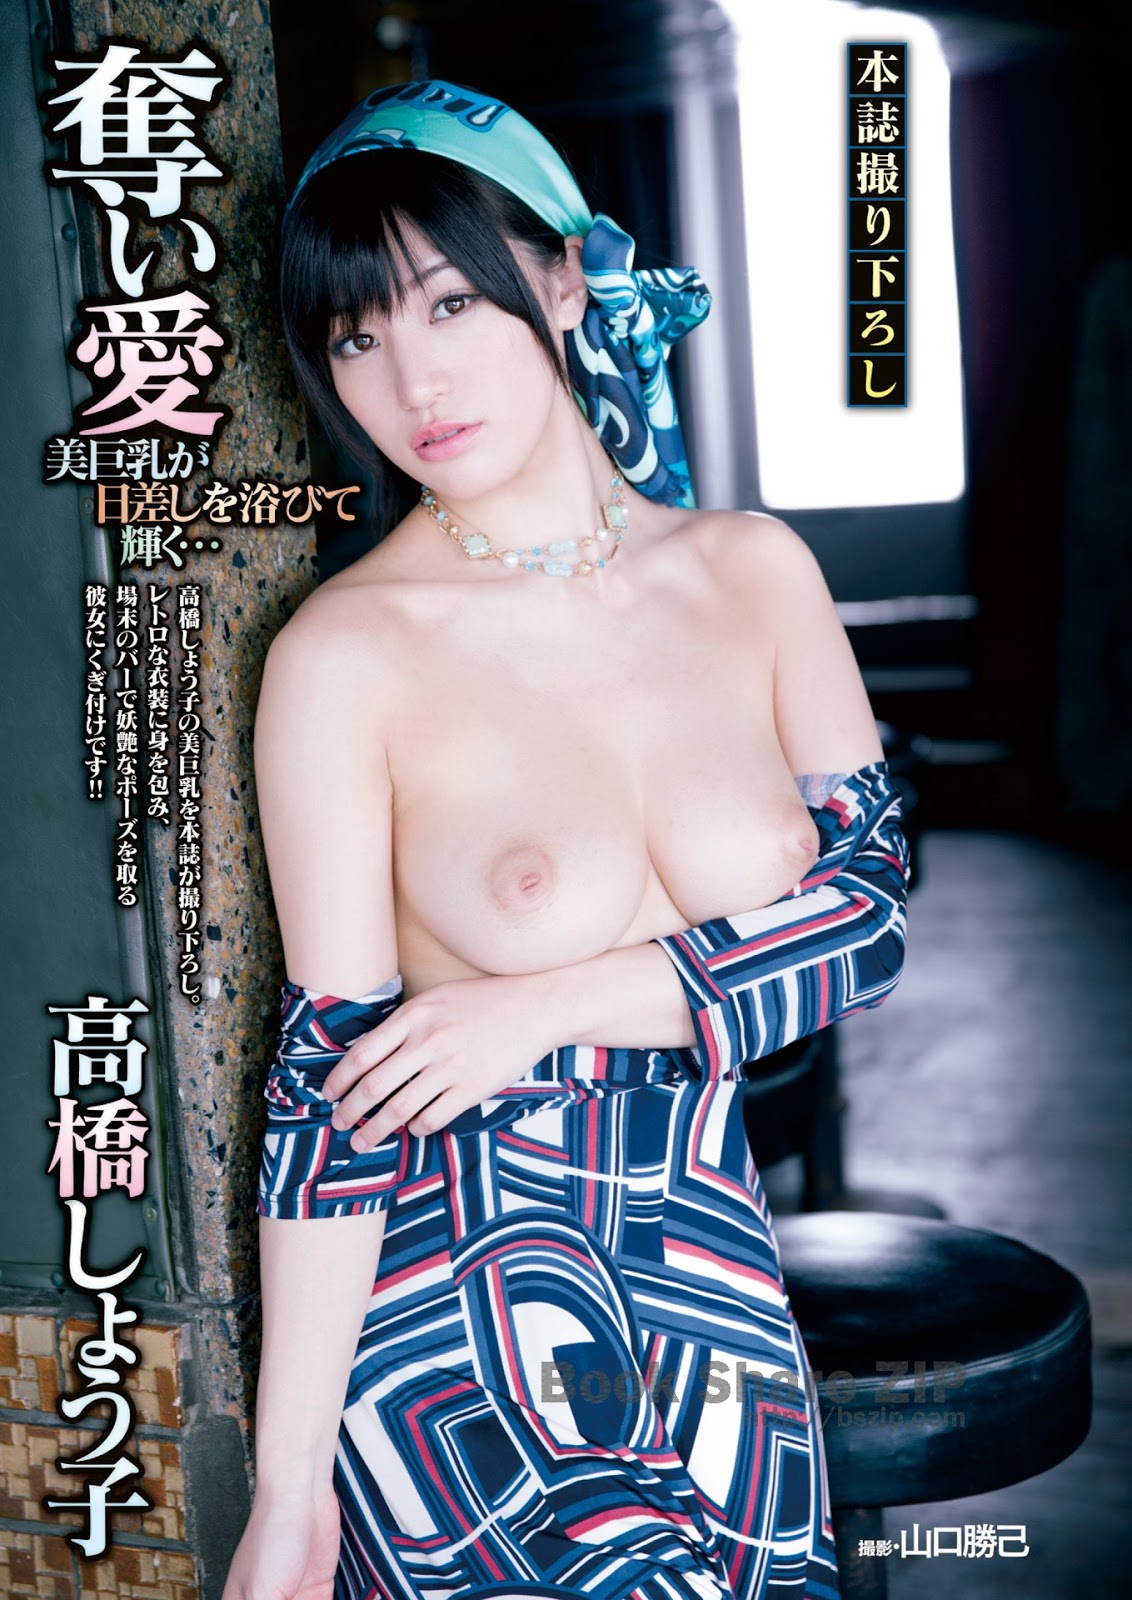 Shoko Takahashi 高橋しょう子, Shukan Jitsuwa 2017.8.24 (週刊実話 2017年8月24日号)